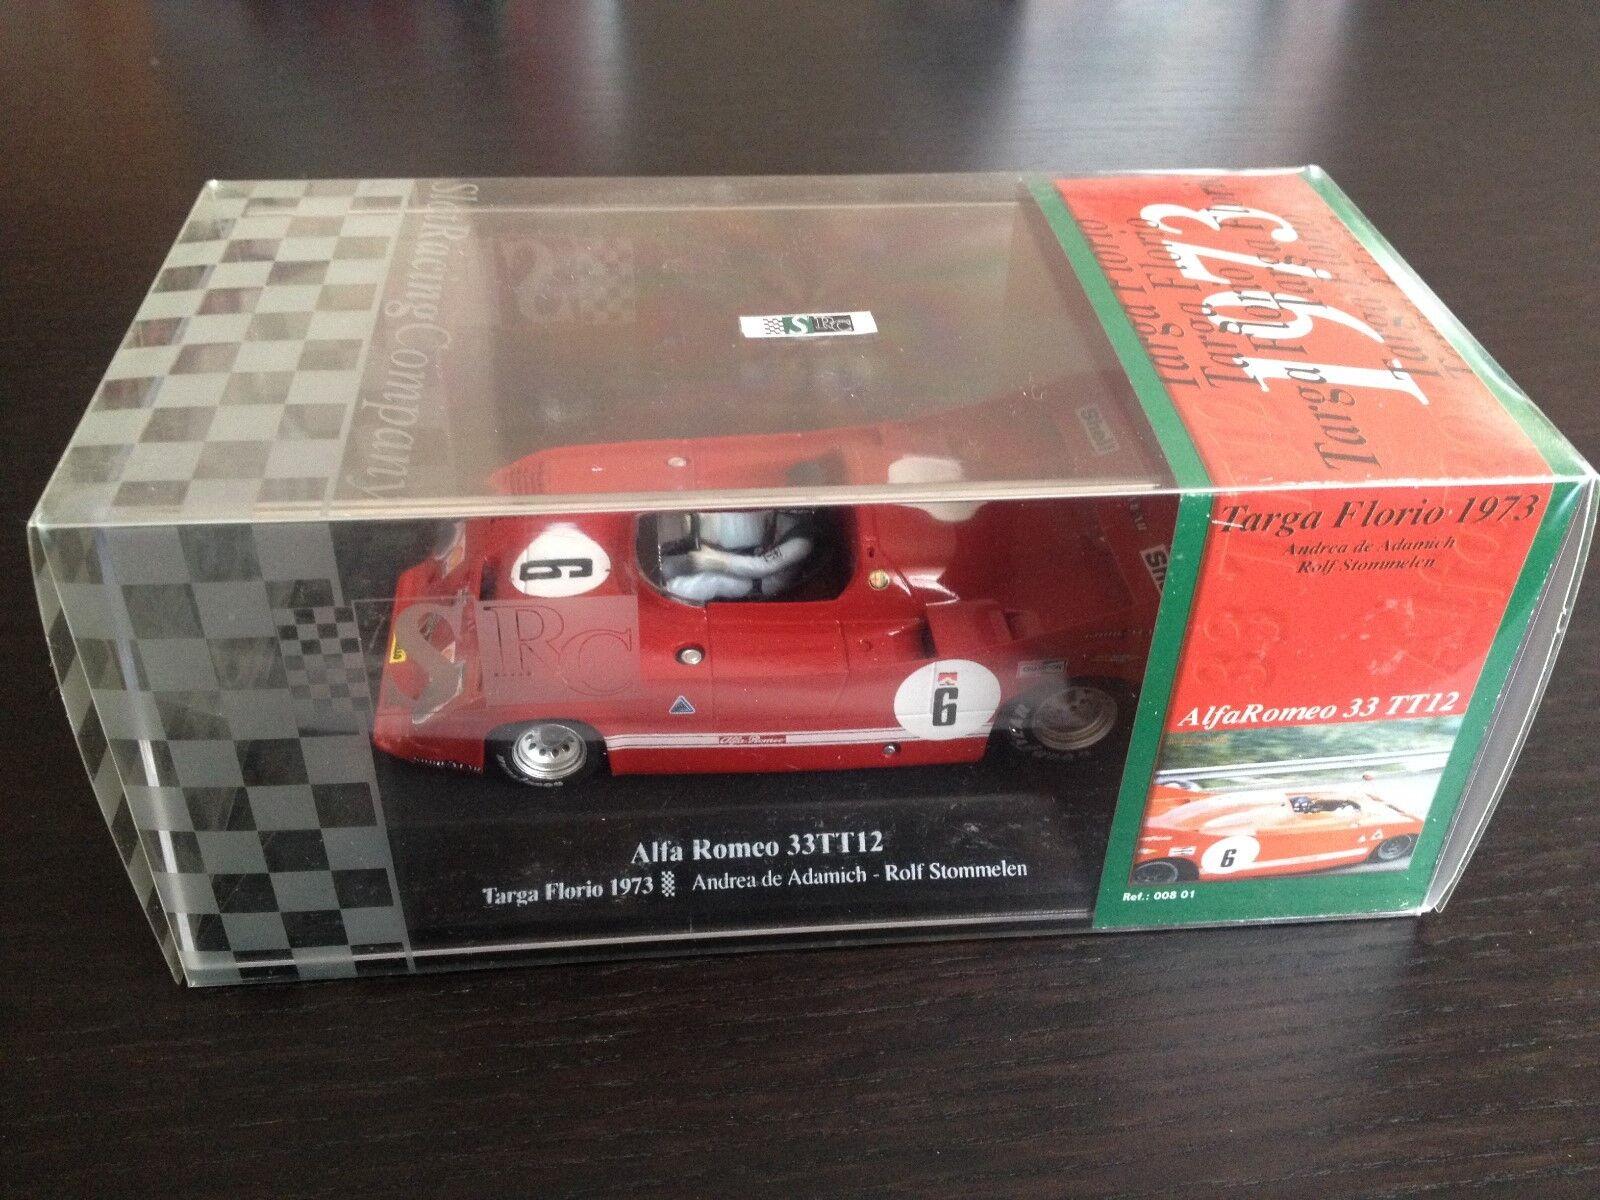 SRC slot car Alfa Romeo 33 TT12 Targa Florio 1973 A. von Adamich R. stommelen